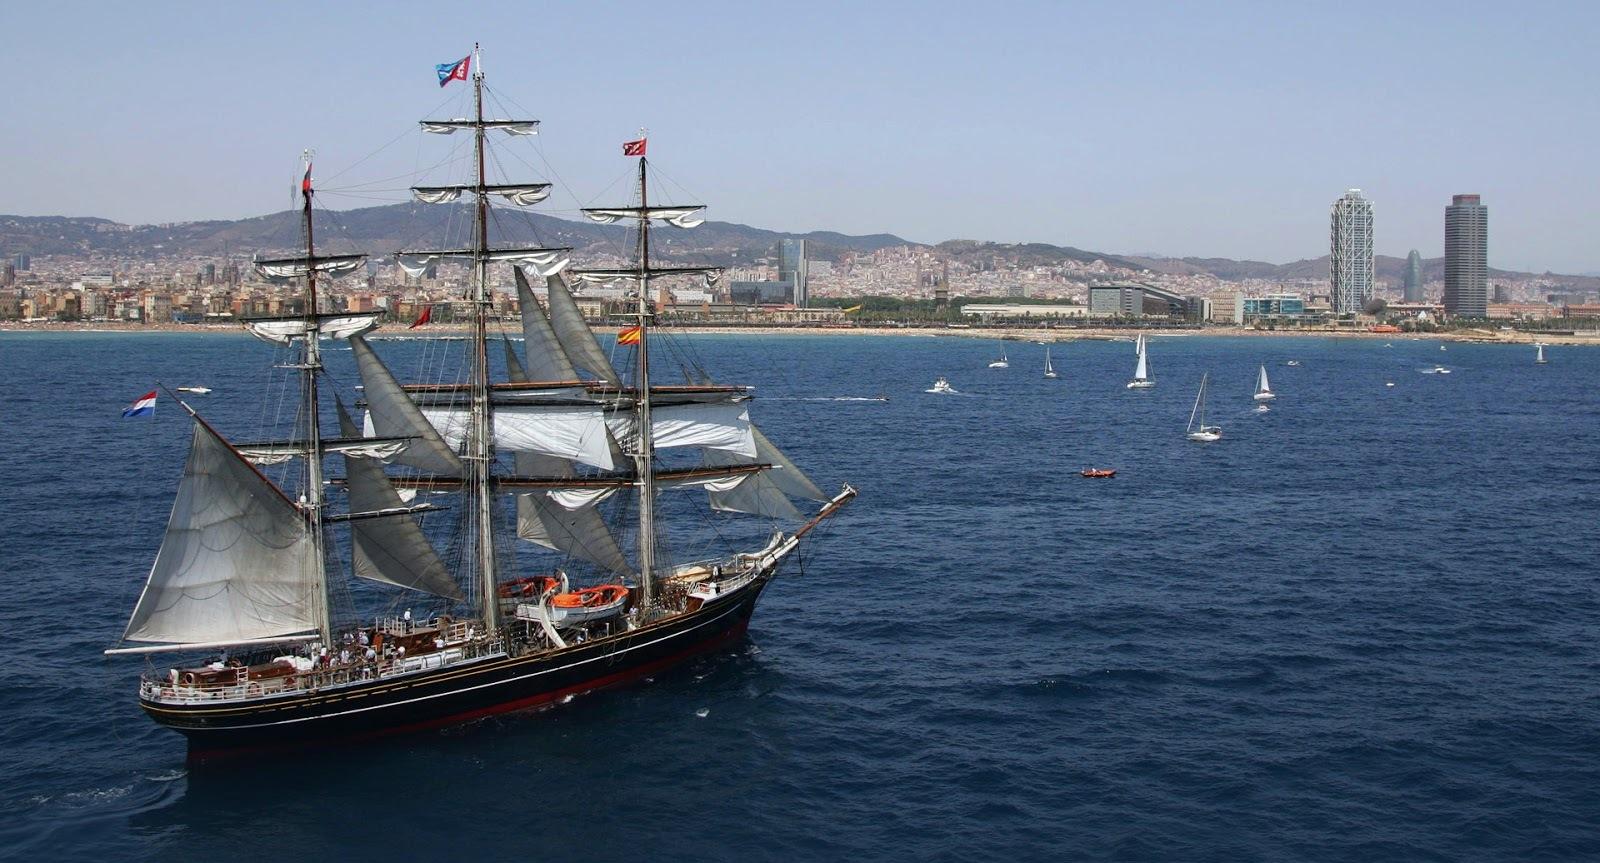 Mediterranean Tall Ship Regatta